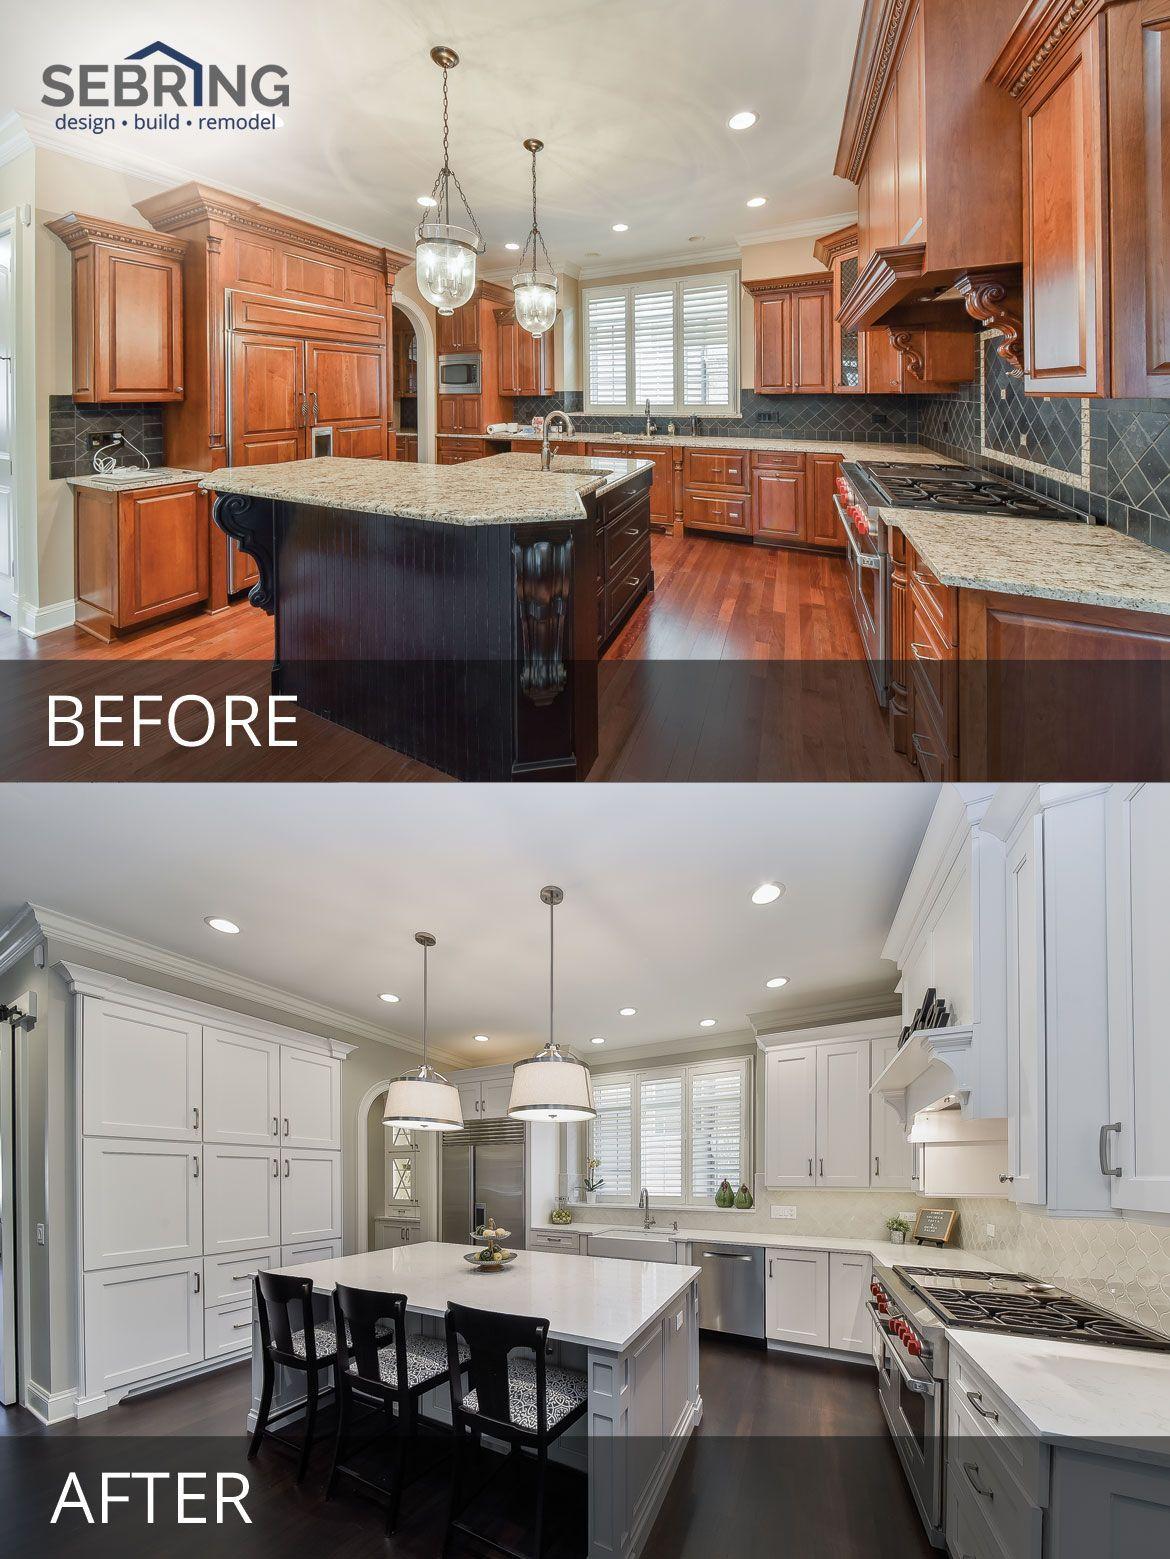 naperville whole house remodel sebring design build rh pinterest com